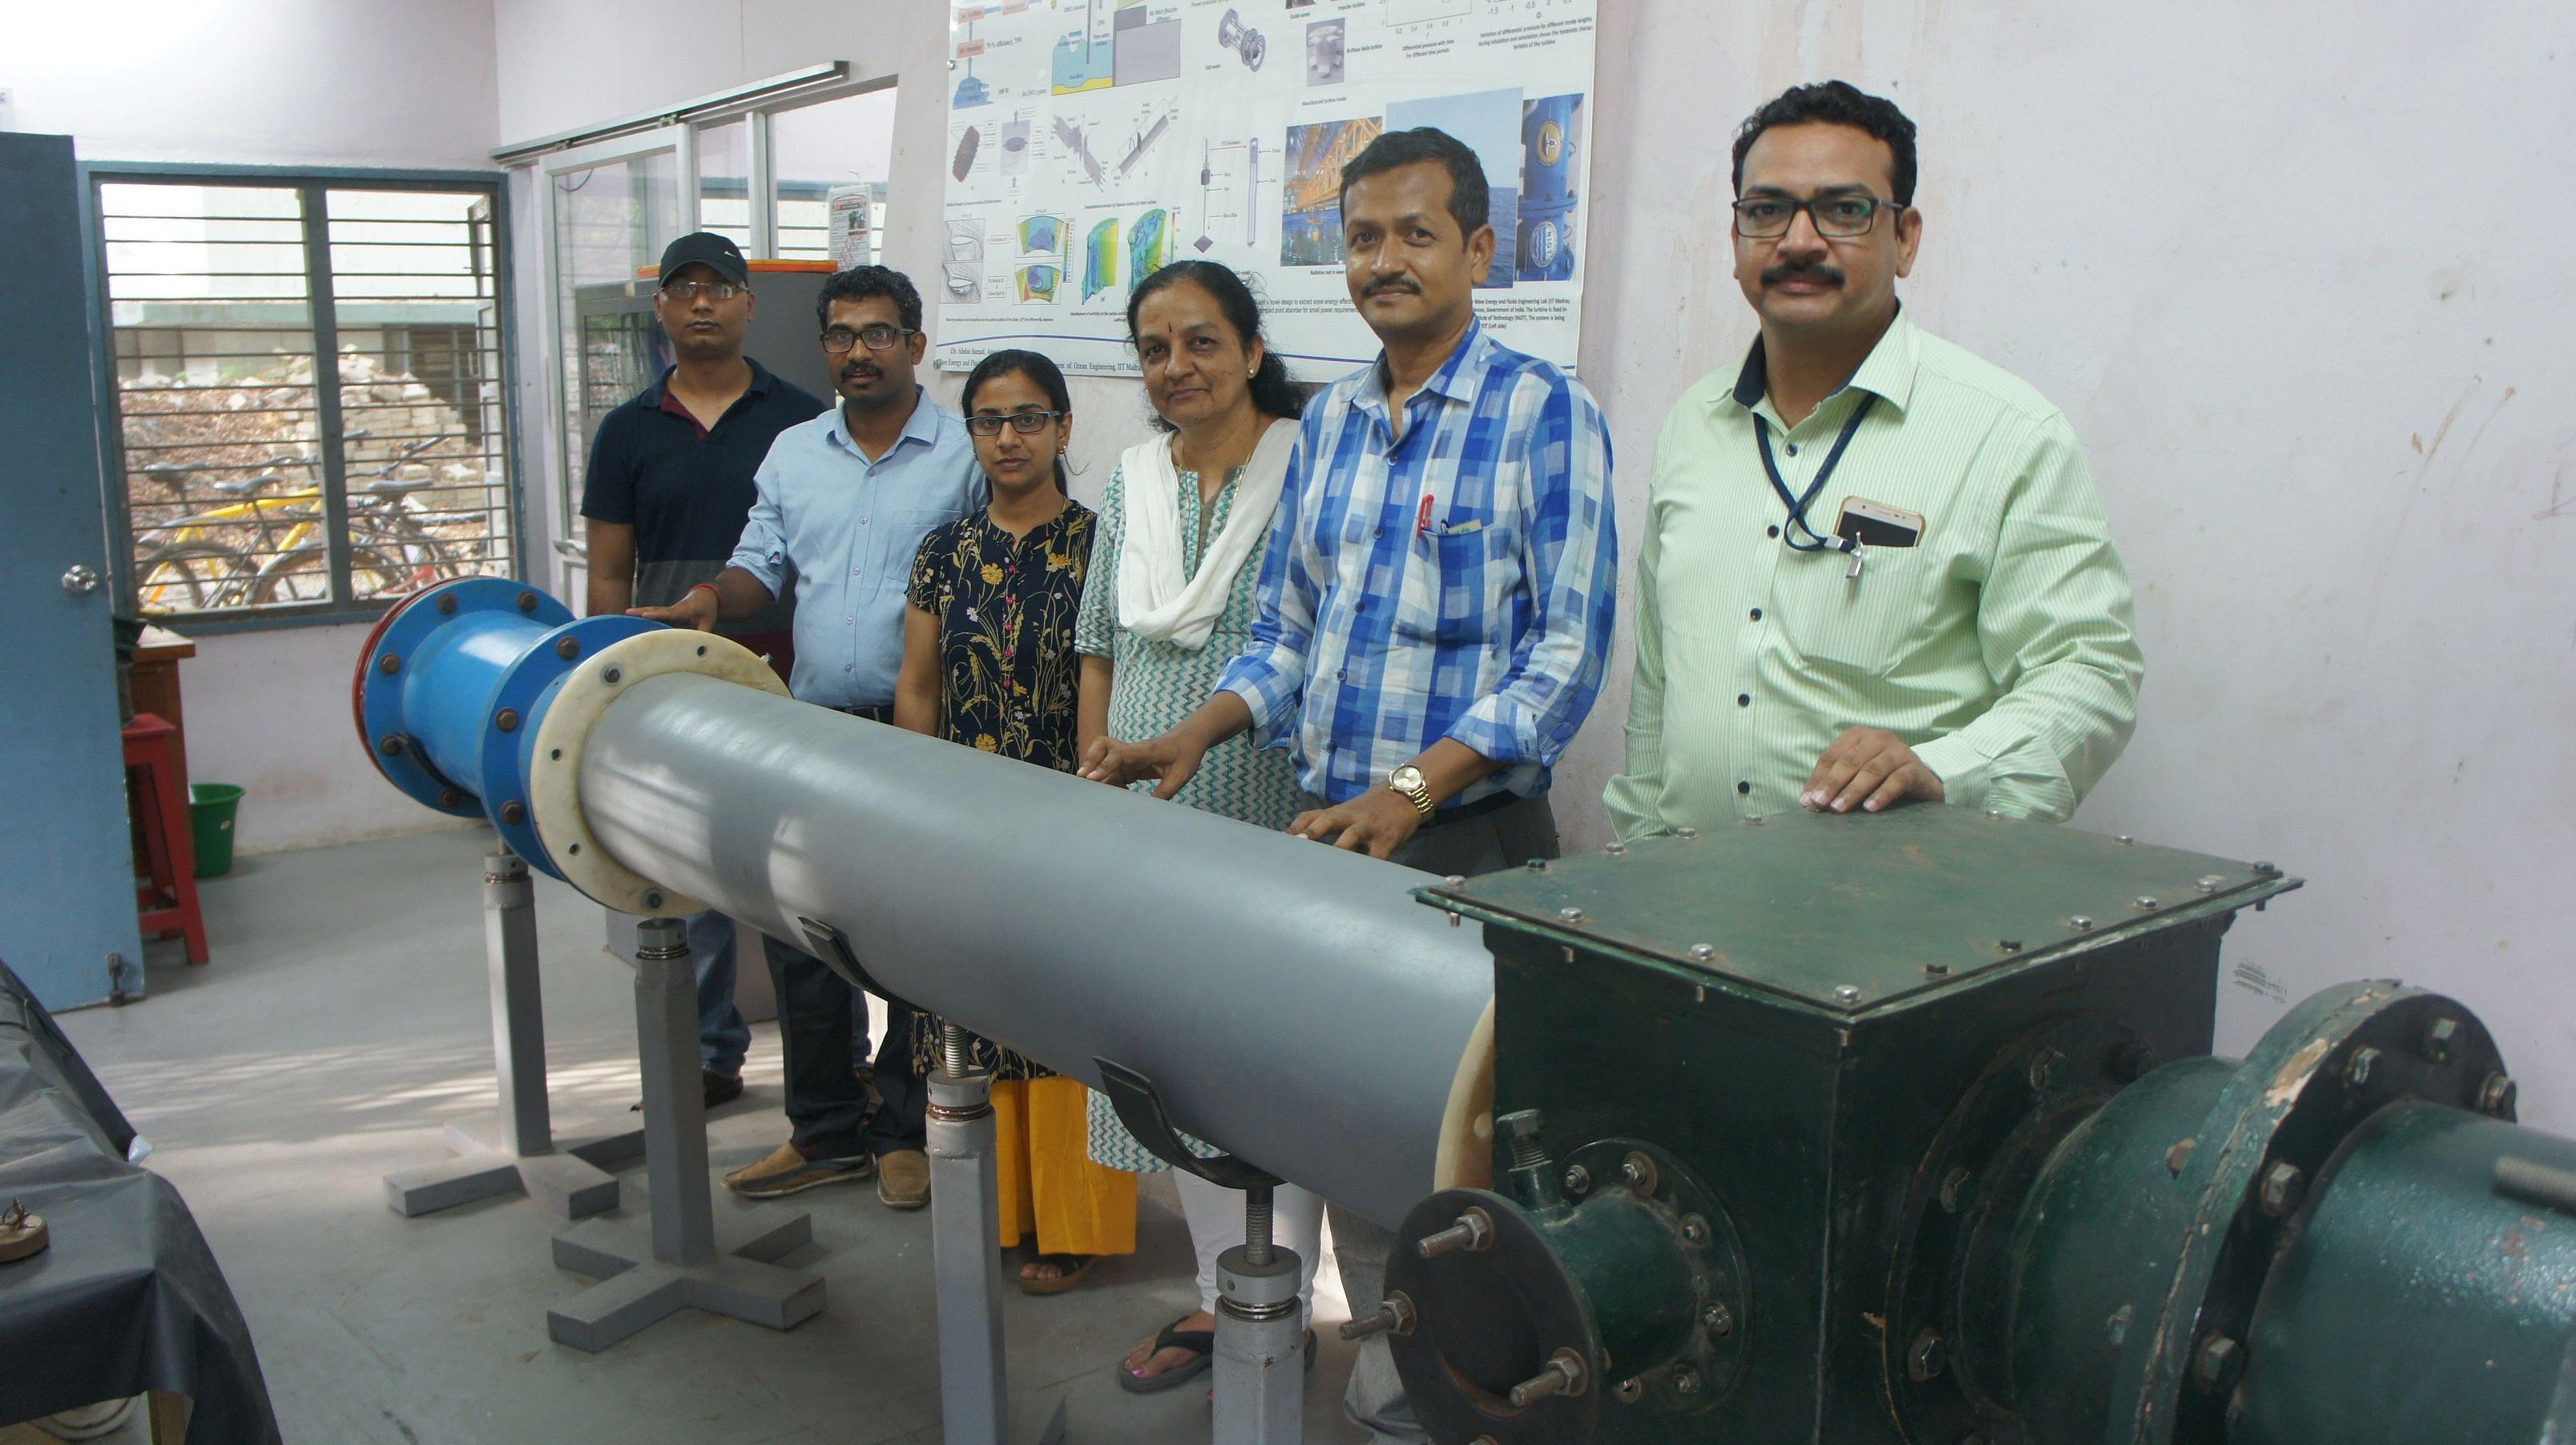 (From L-to-R) The research team Mr Ananth Narayan, Mr Biren Patnaik, Ms Suchithra Ravikumar, Dr Purnima Jalihal, Dr Abdus Samad and Mr Prasad Dudhgaonkar.